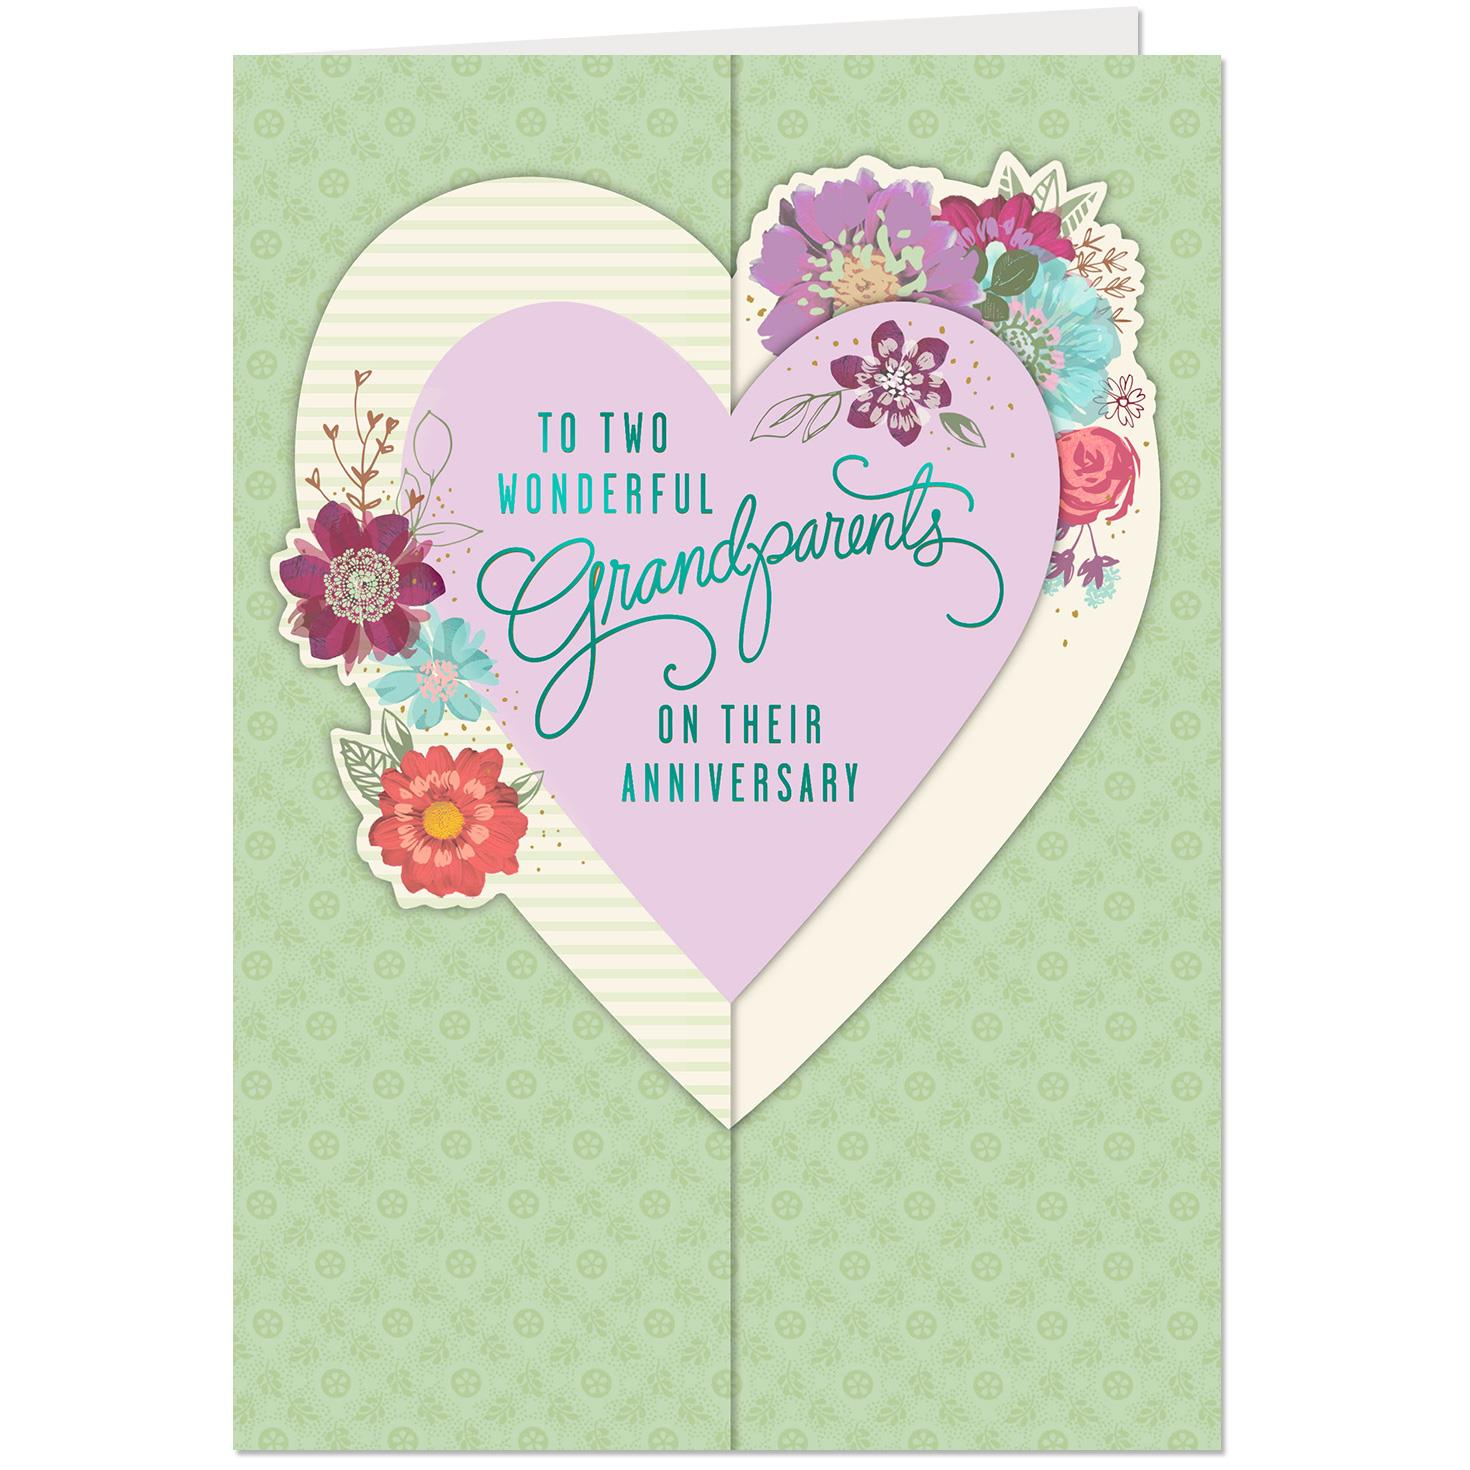 Two Wonderful Grandparents Anniversary Card Greeting Cards Hallmark